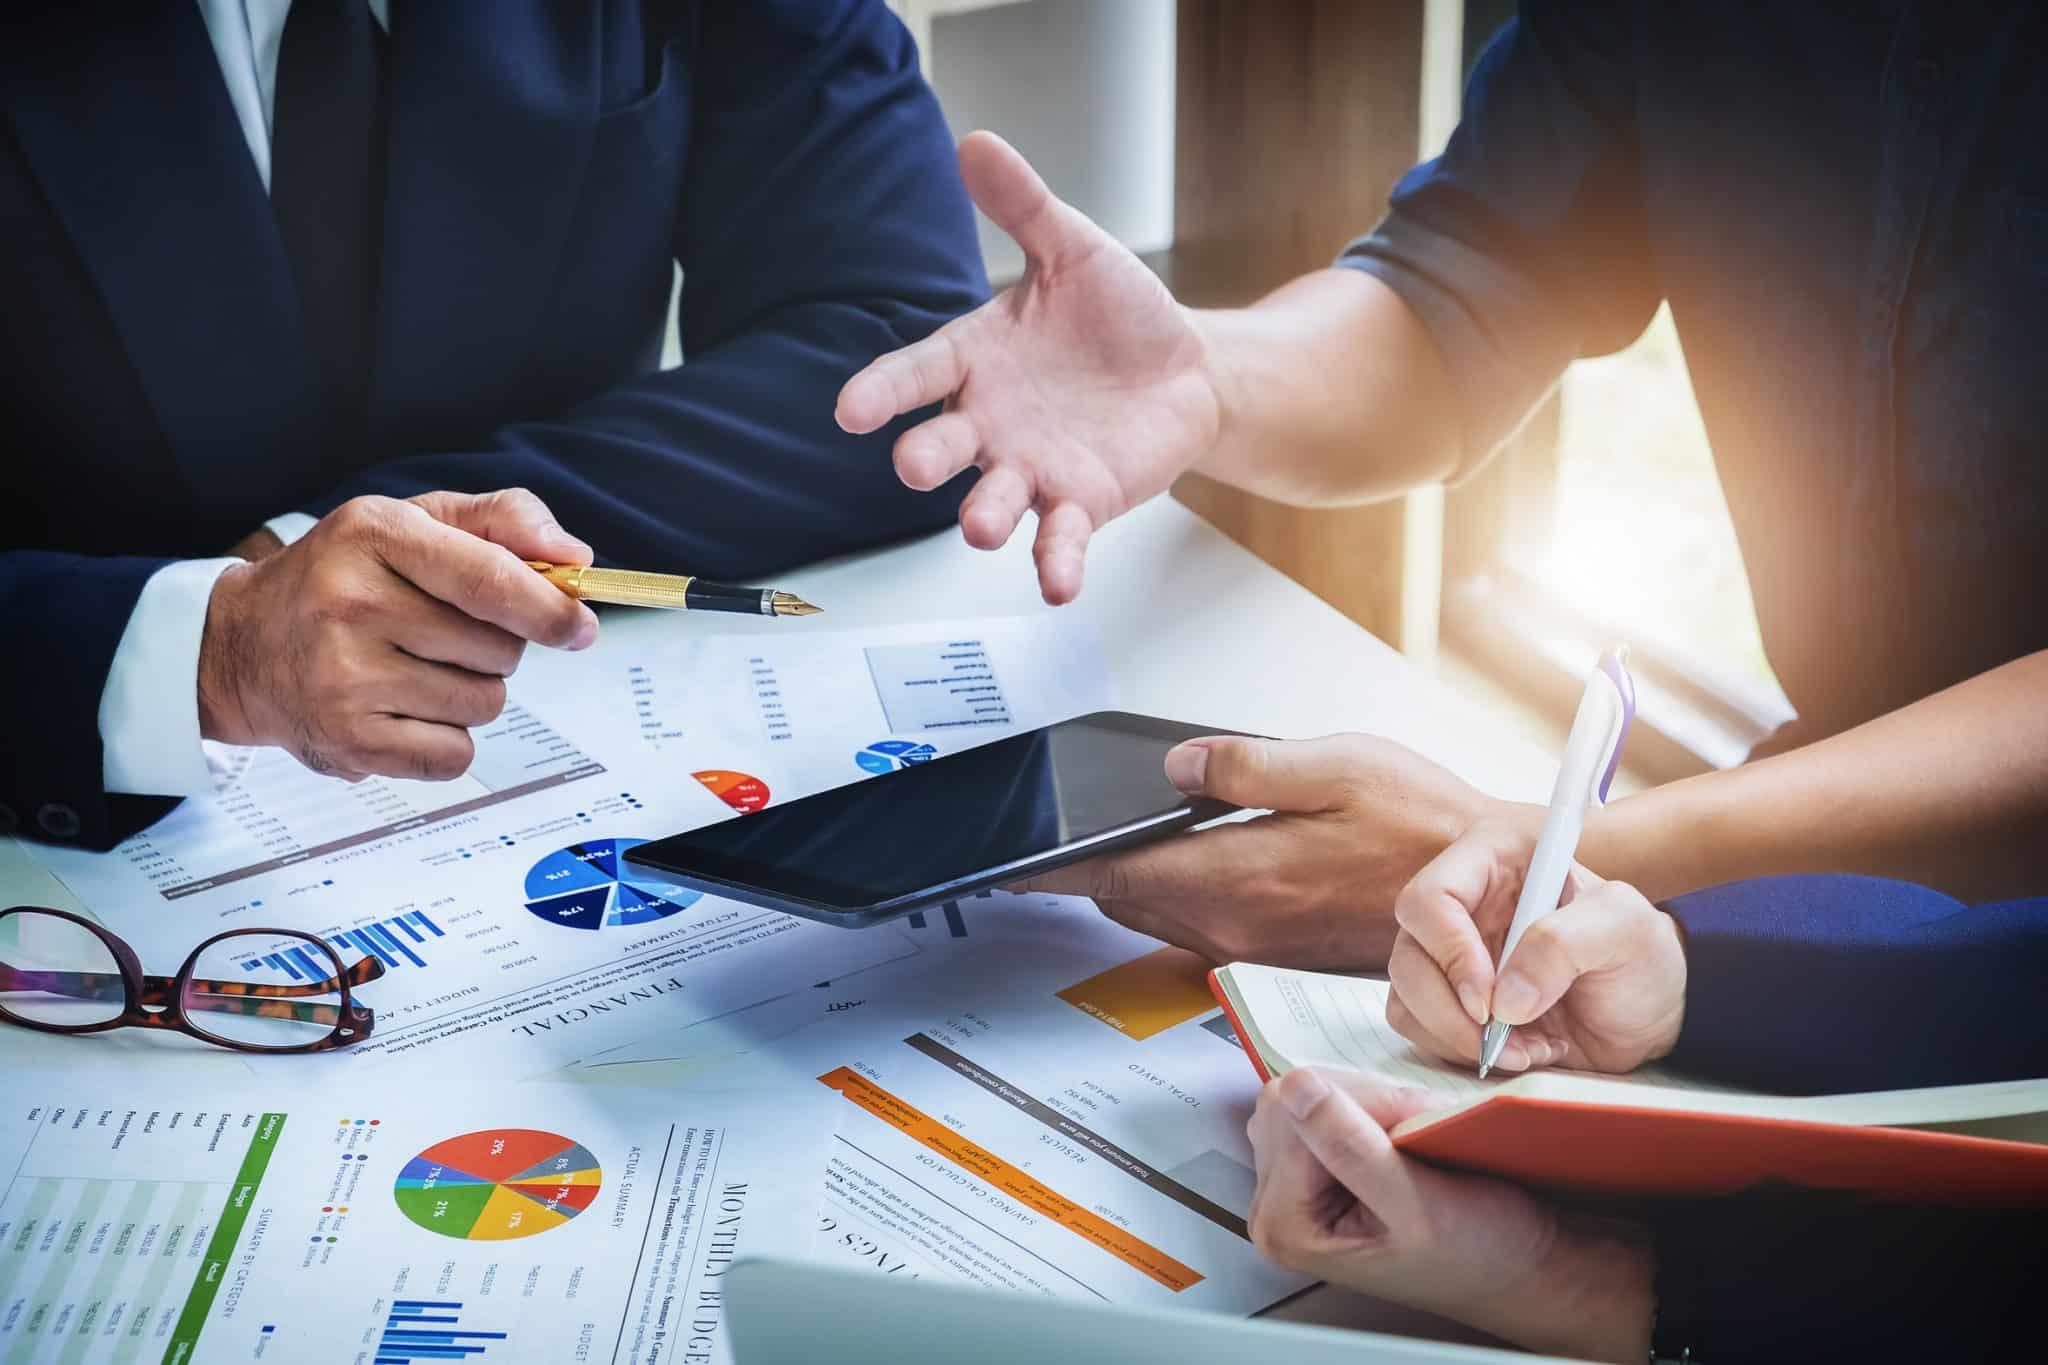 Lehrgang Verhandlungstraining Einkäufer